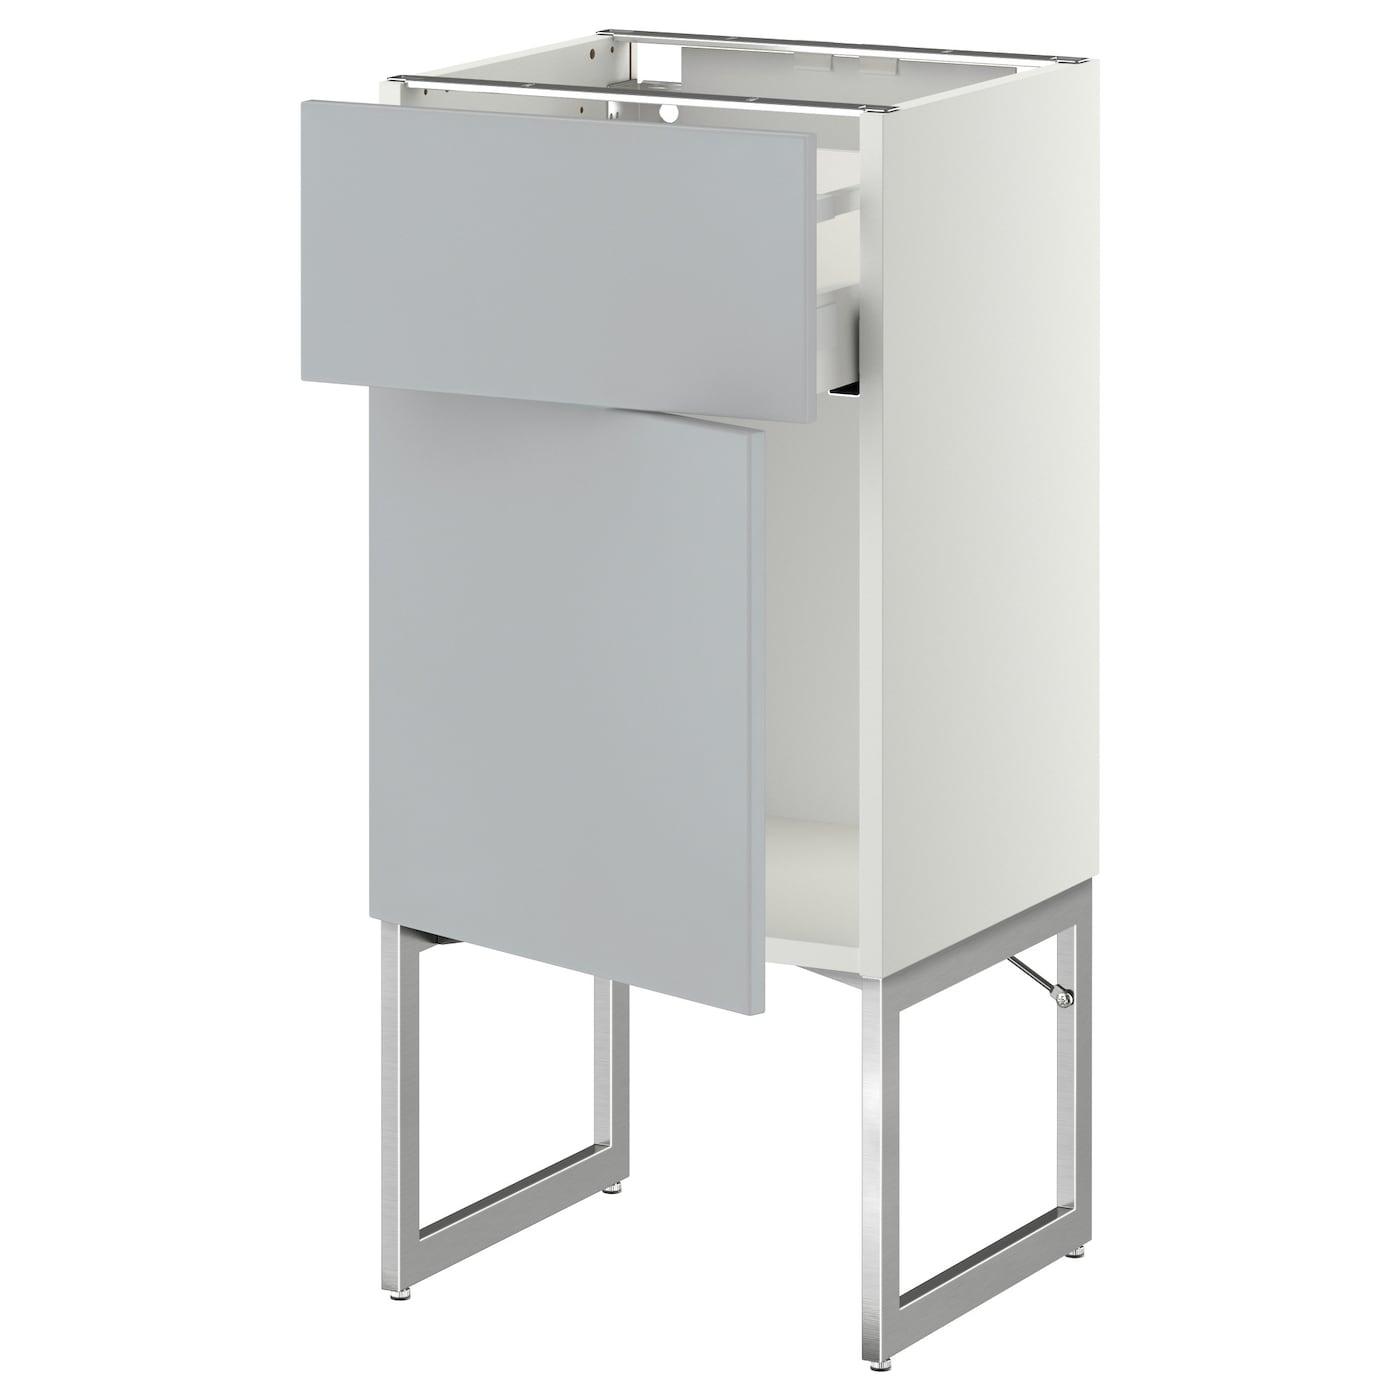 metod maximera base cabinet with drawer door white veddinge grey 40x37x60 cm ikea. Black Bedroom Furniture Sets. Home Design Ideas